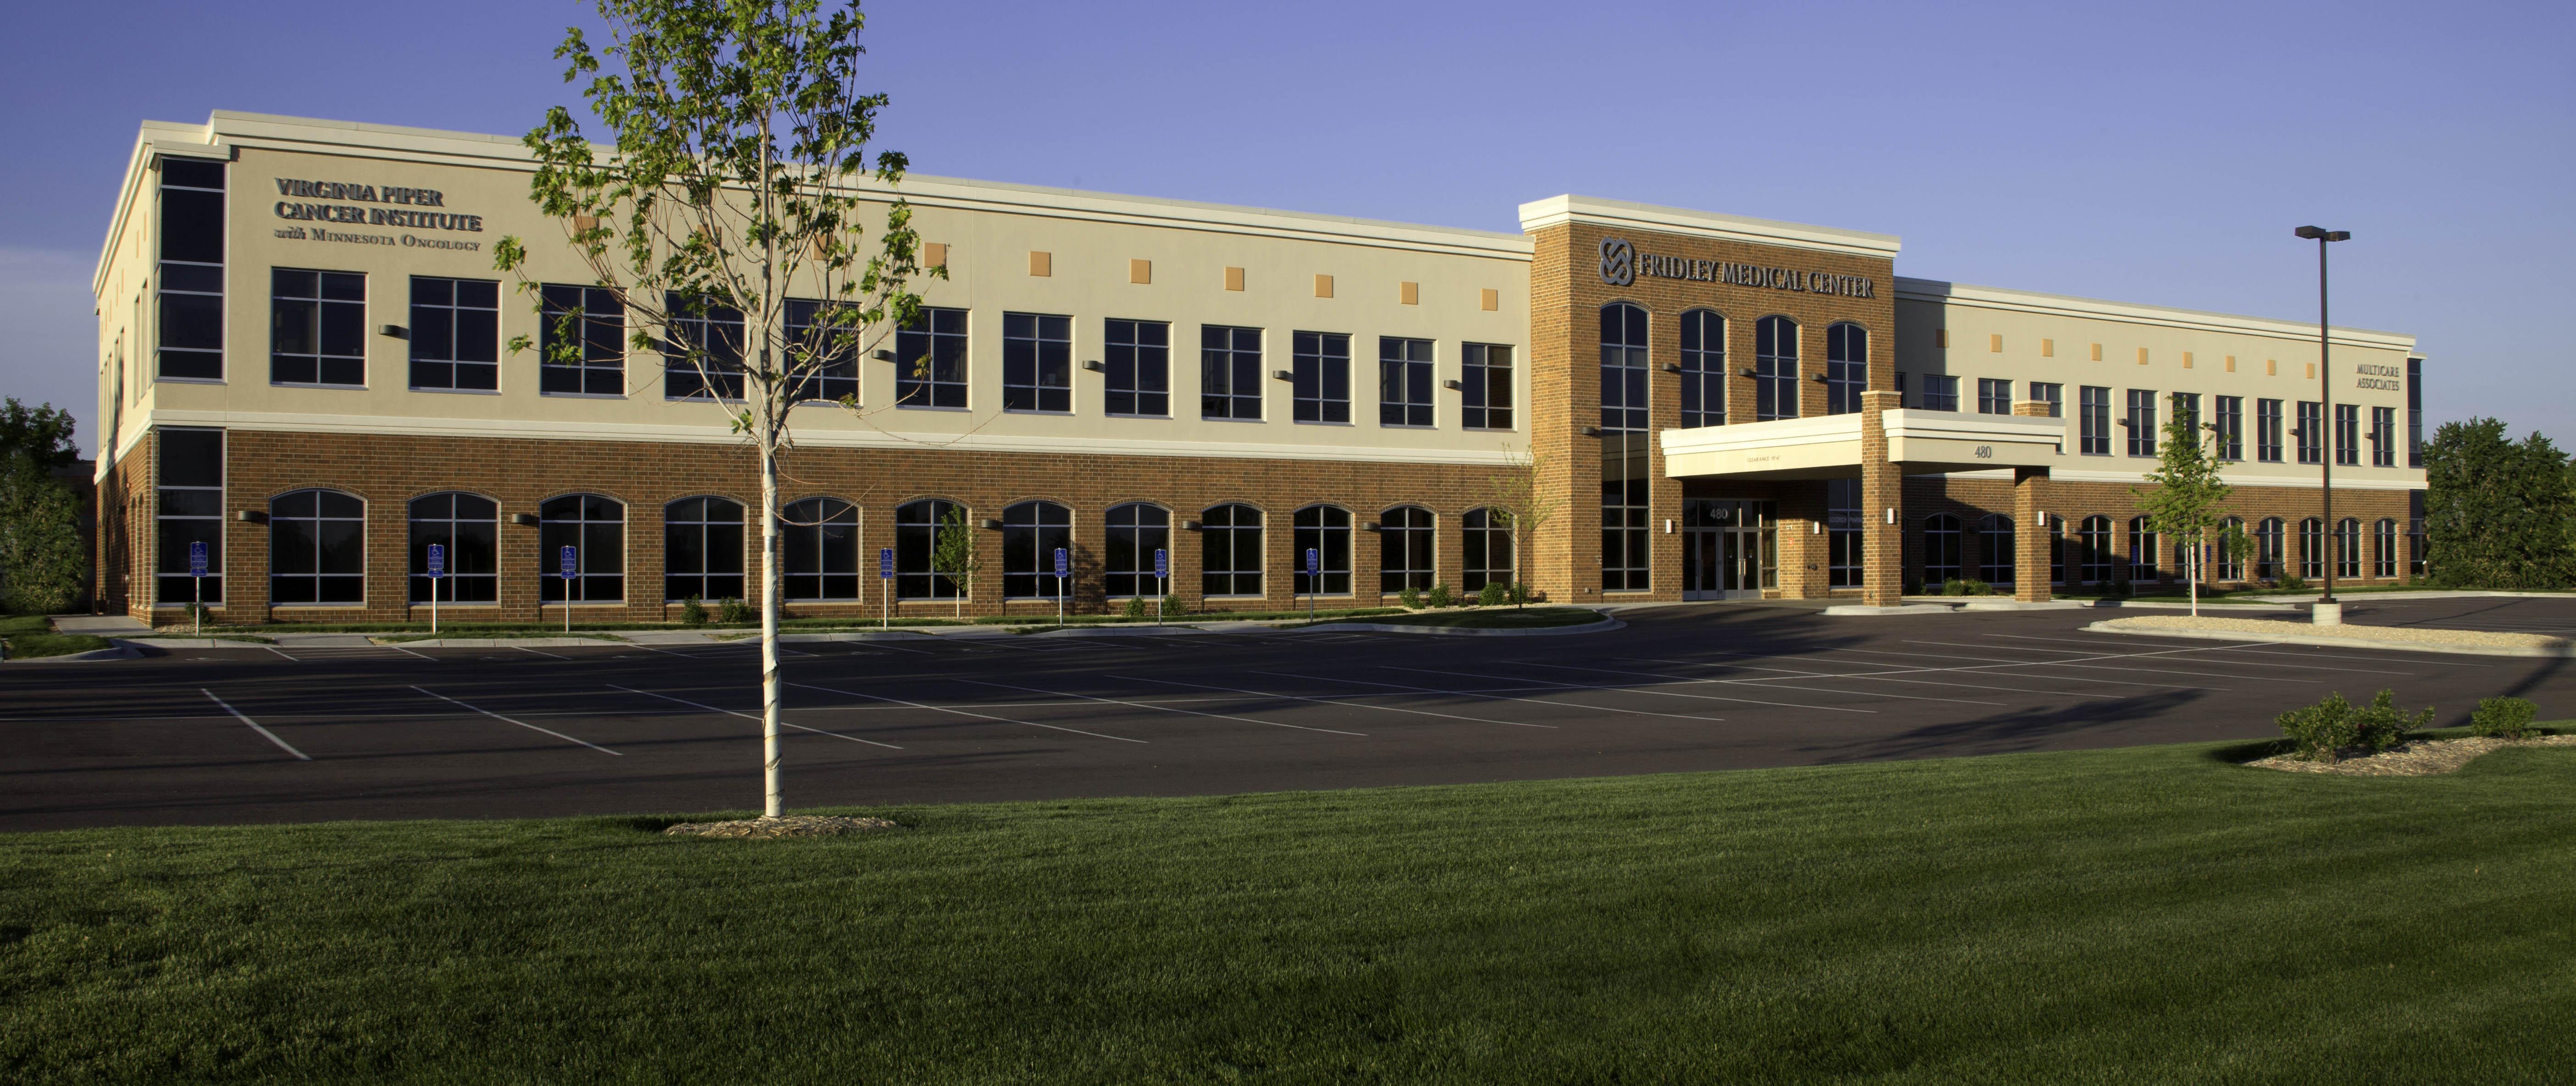 Premier_Commercial_Properties_MN_Fridley_Medical_Center